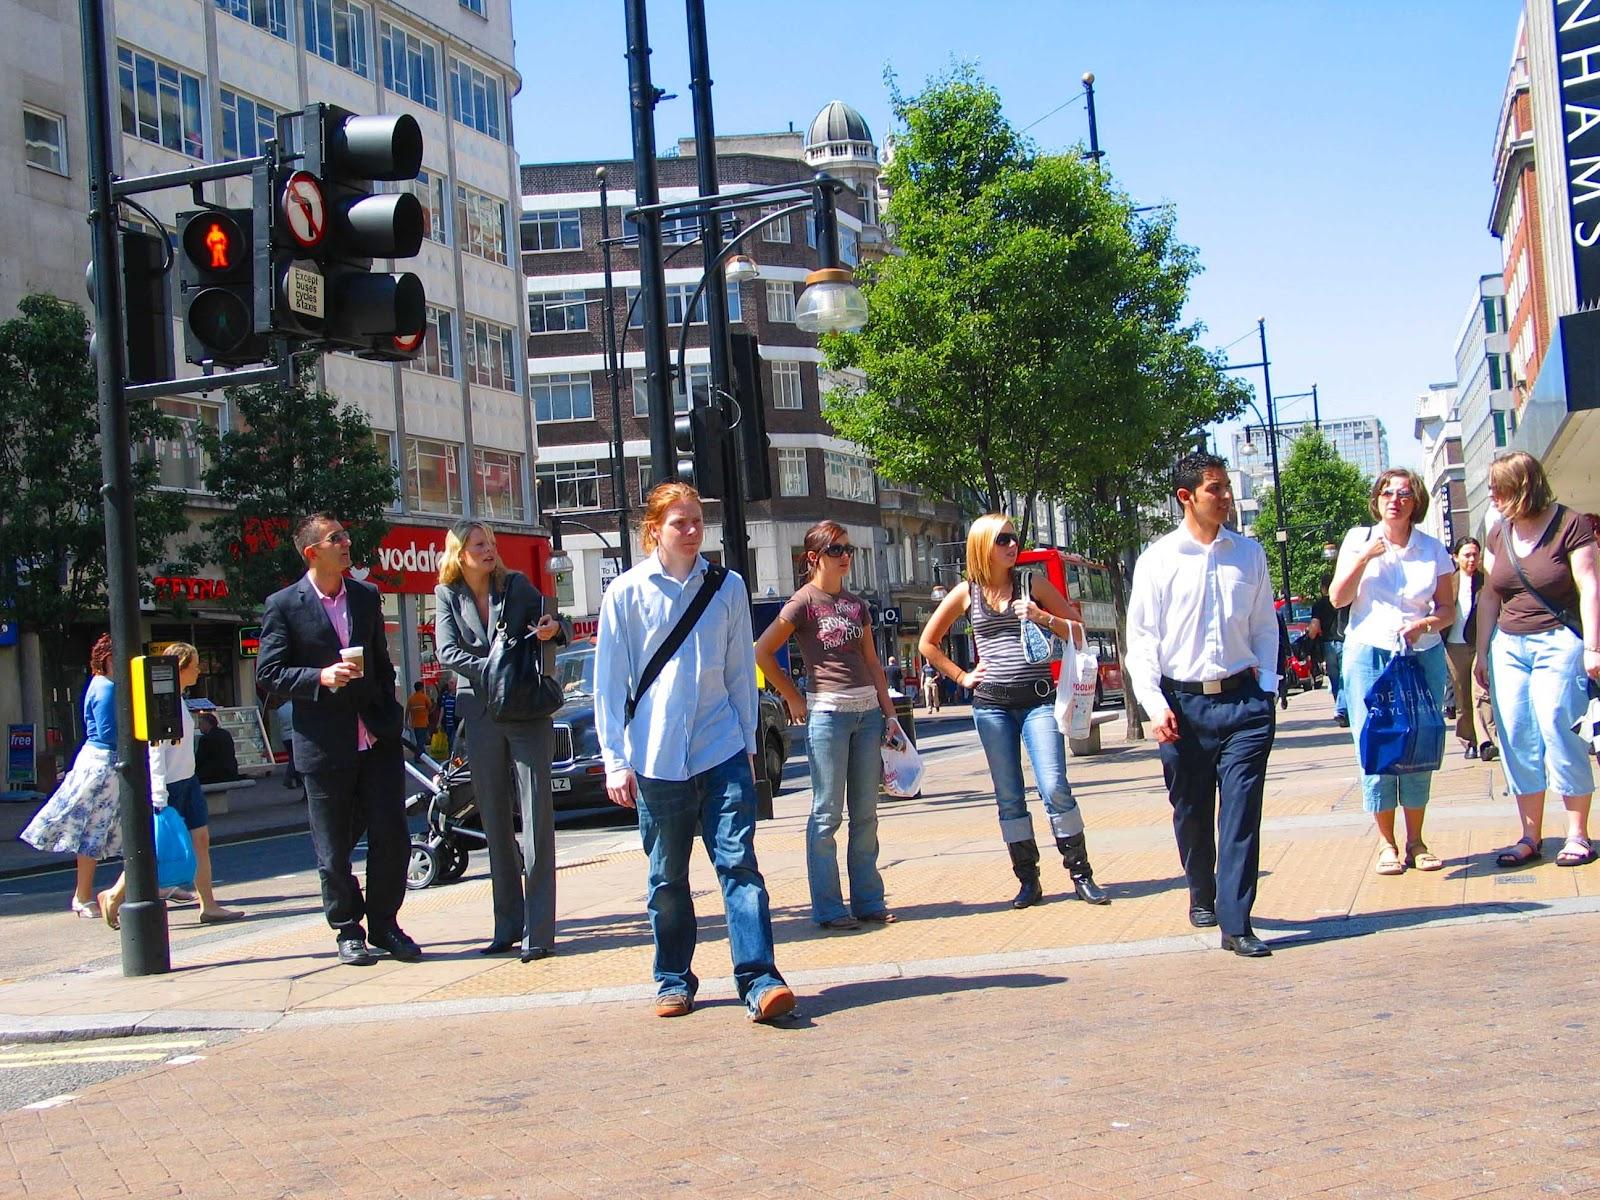 Free photo: City, People, Pedestrians, Walking - Free ...  |Person Walking City